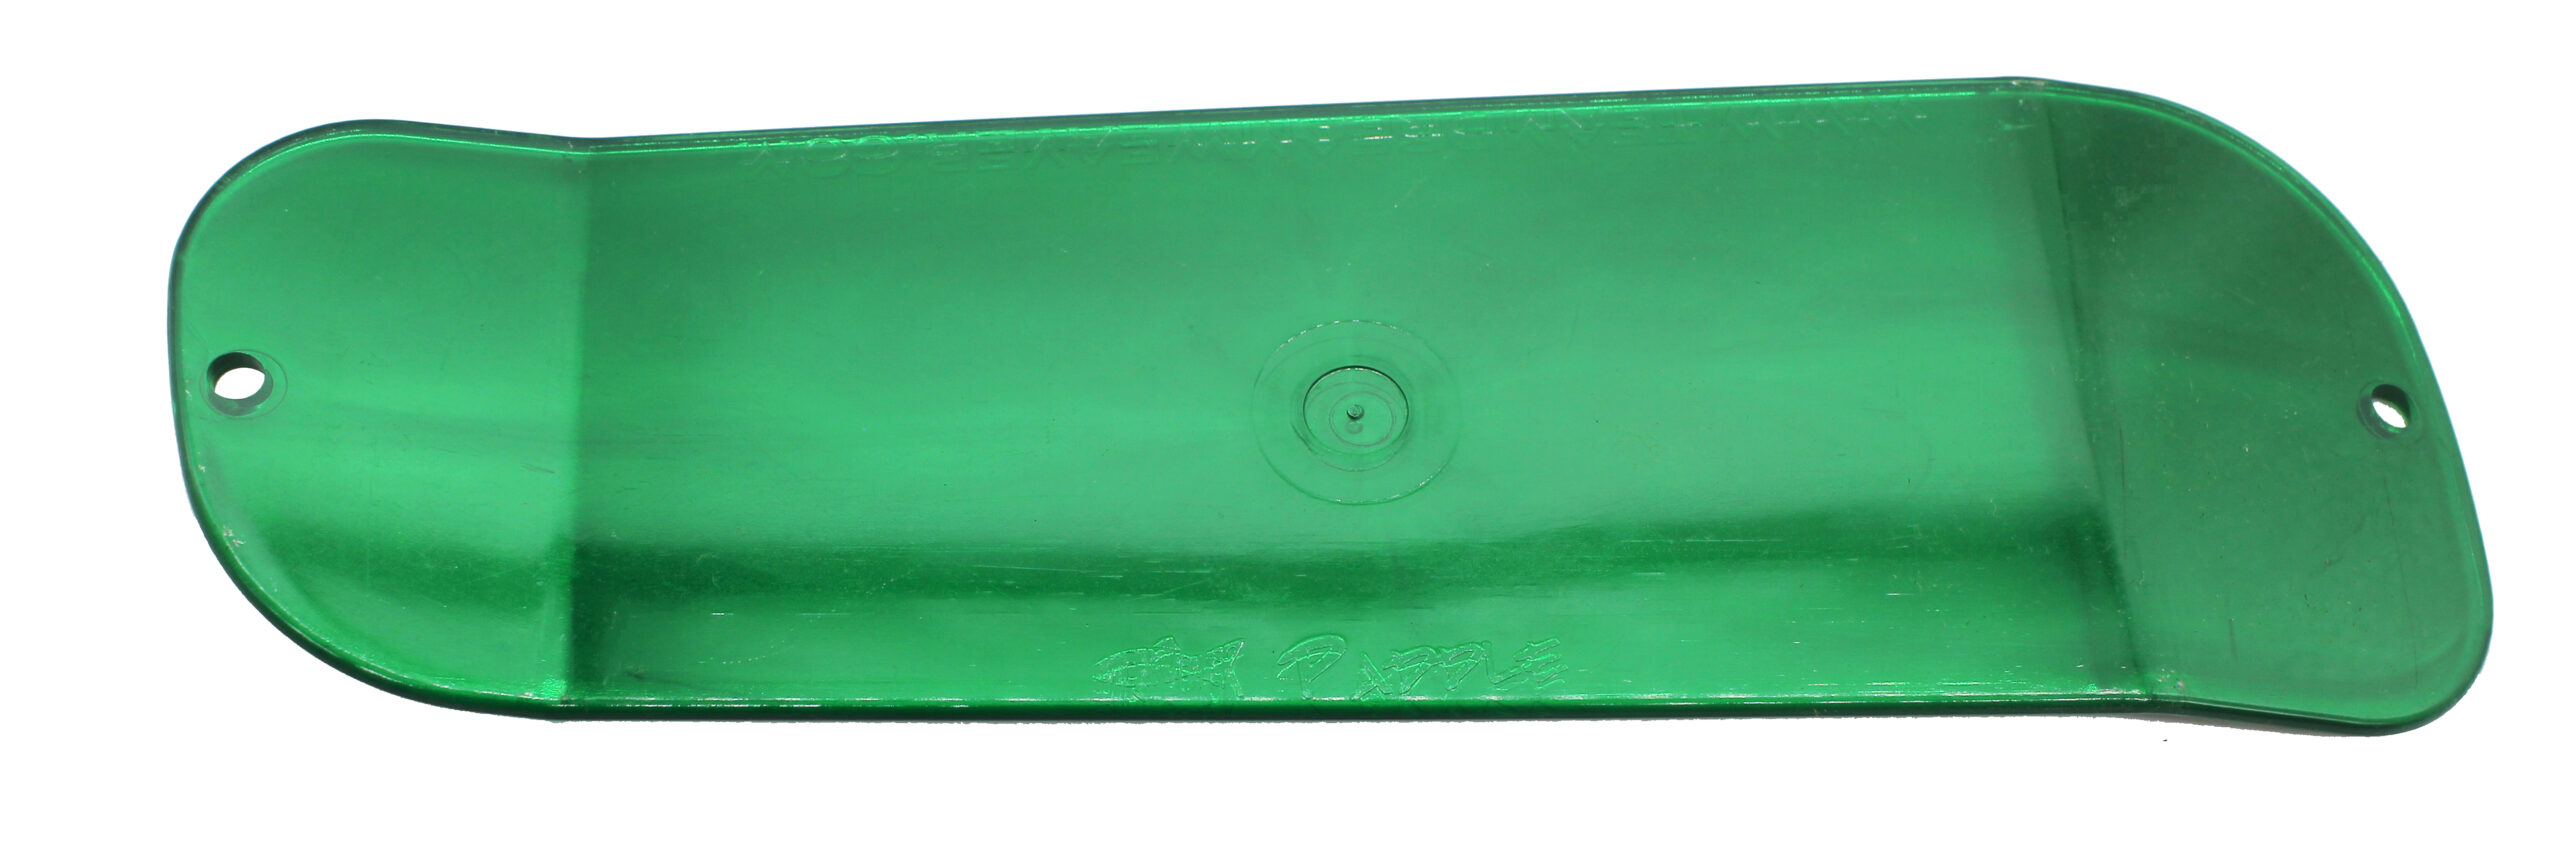 Paddle 11 – Em. Green/Chrome